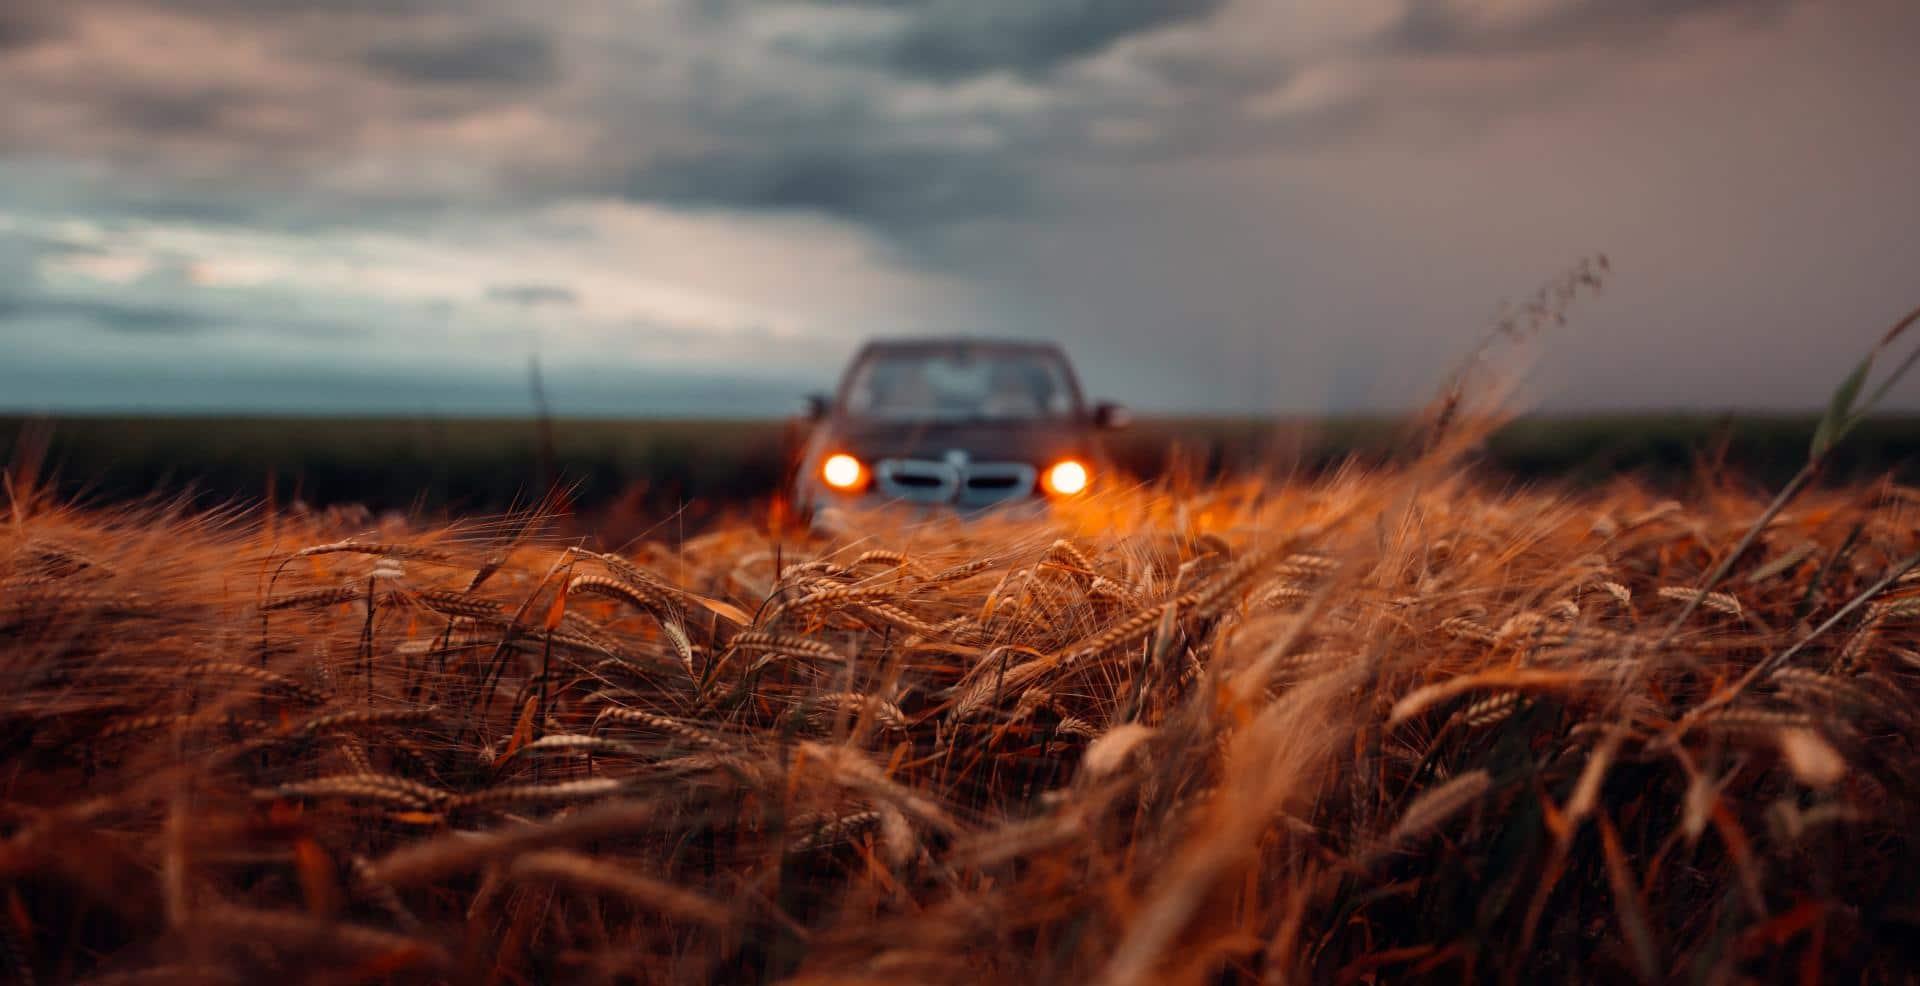 Aktueller Global EV Outlook erwartet 245 Millionen E-Fahrzeuge bis 2030